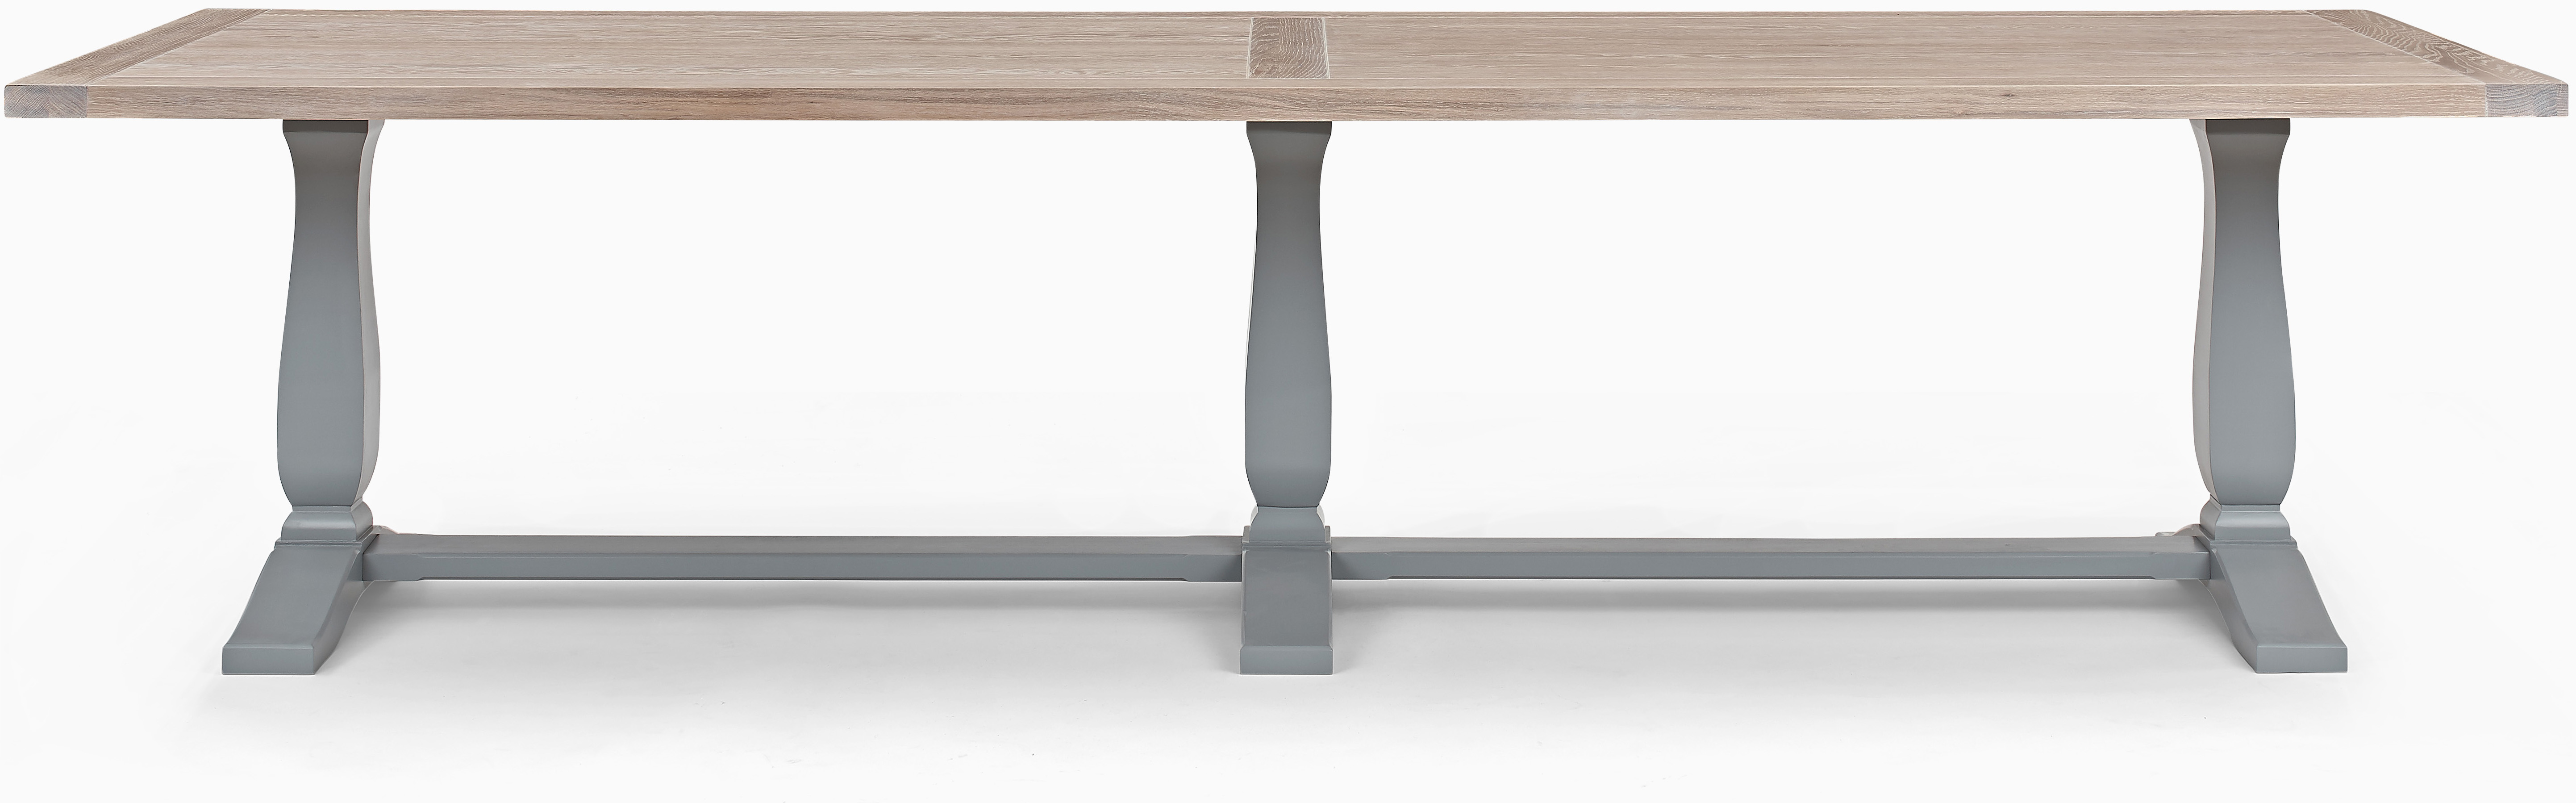 Harrogate 12 Seater Dining Table